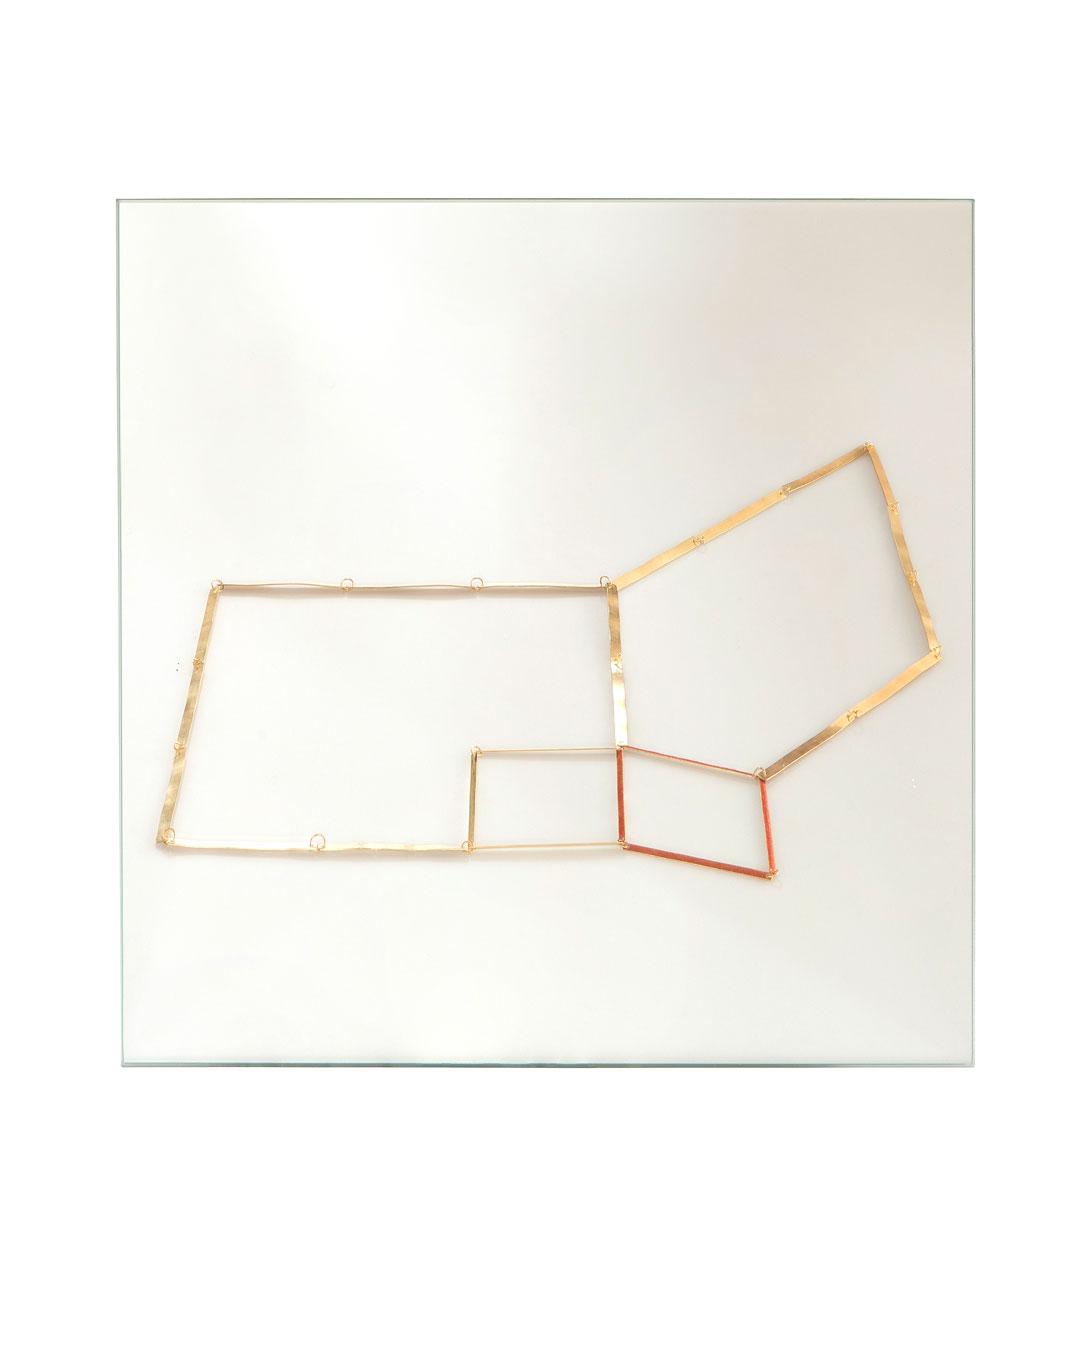 Annelies Planteijdt, Mooie stad - Collier en spiegel (Beautiful City - Necklace and Mirror), 2017, mirror (image 3/3)